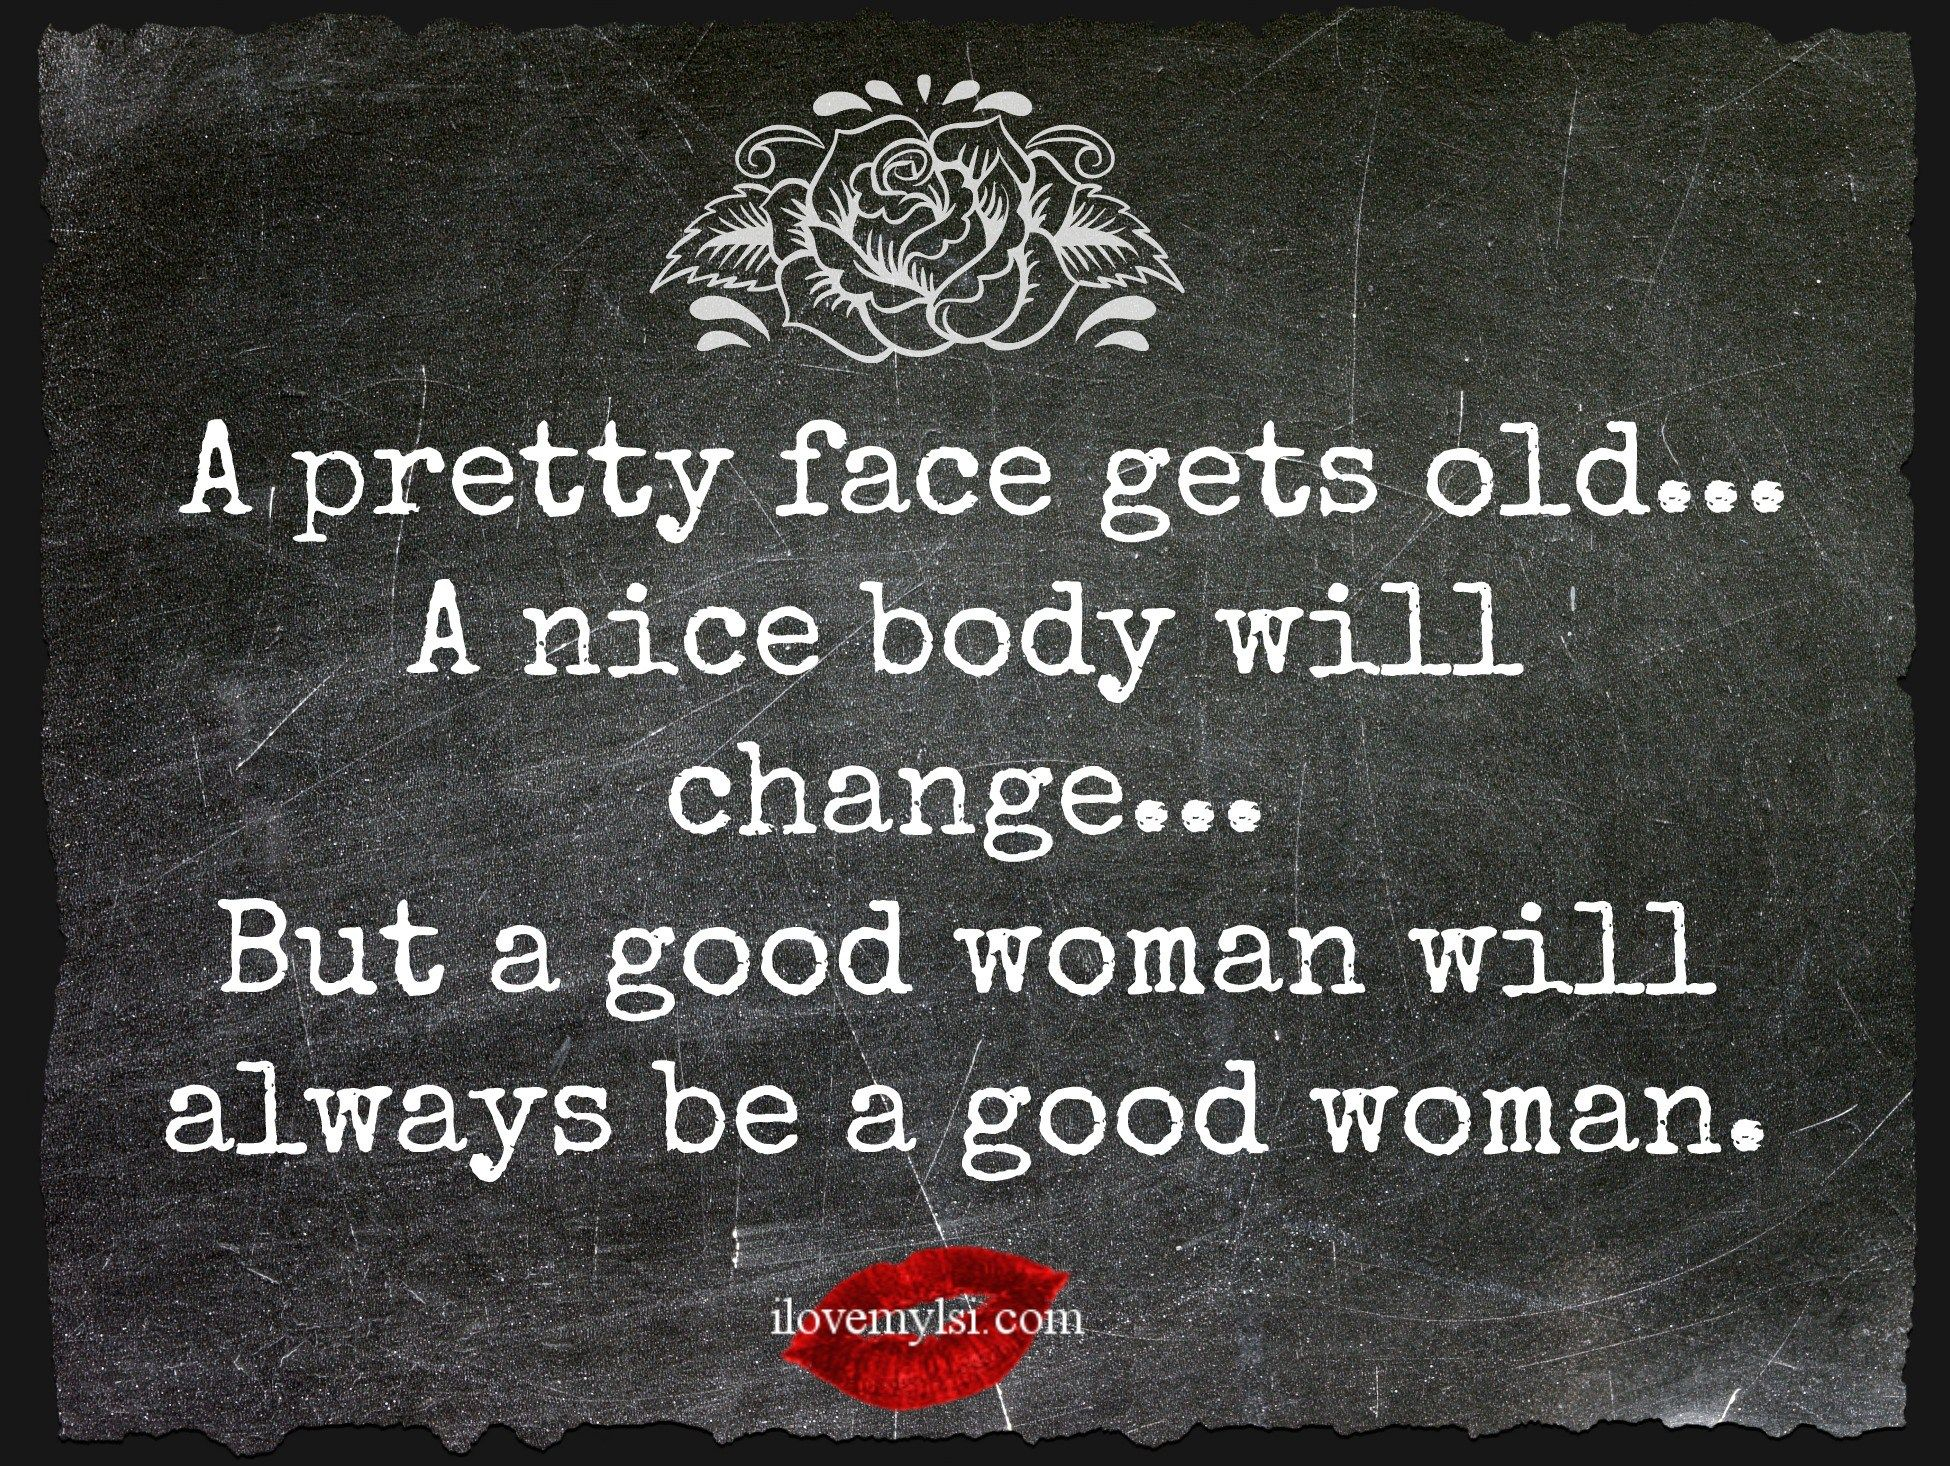 A-good-woman-will-always-be-a-good-woman.jpg (1950×1466)